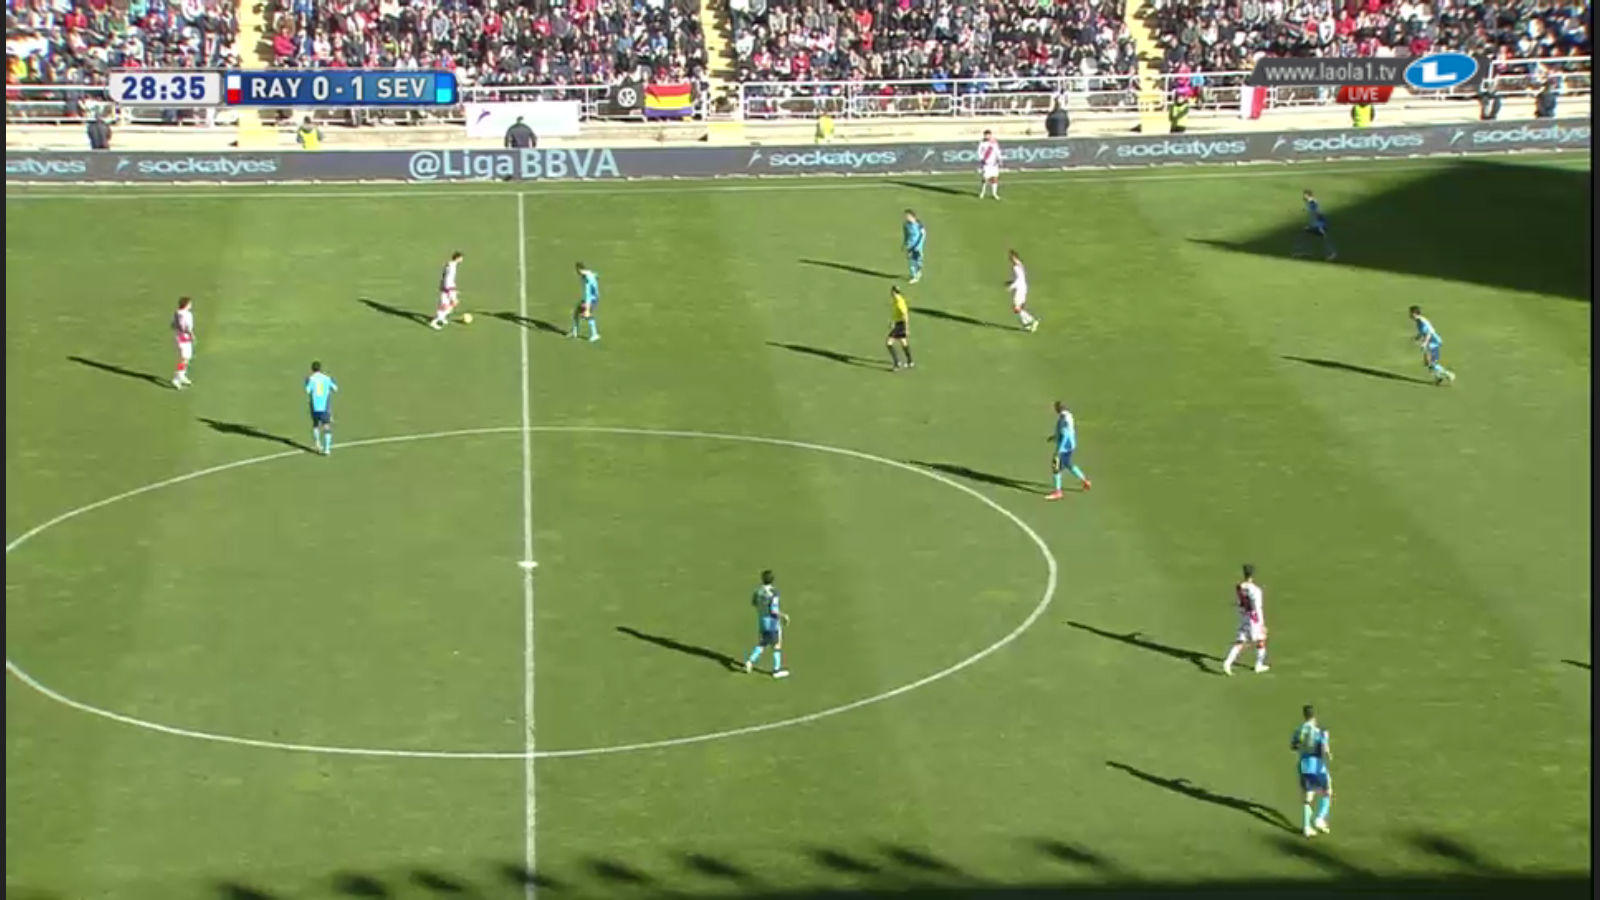 4-3-2-1 Umformung Sevilla